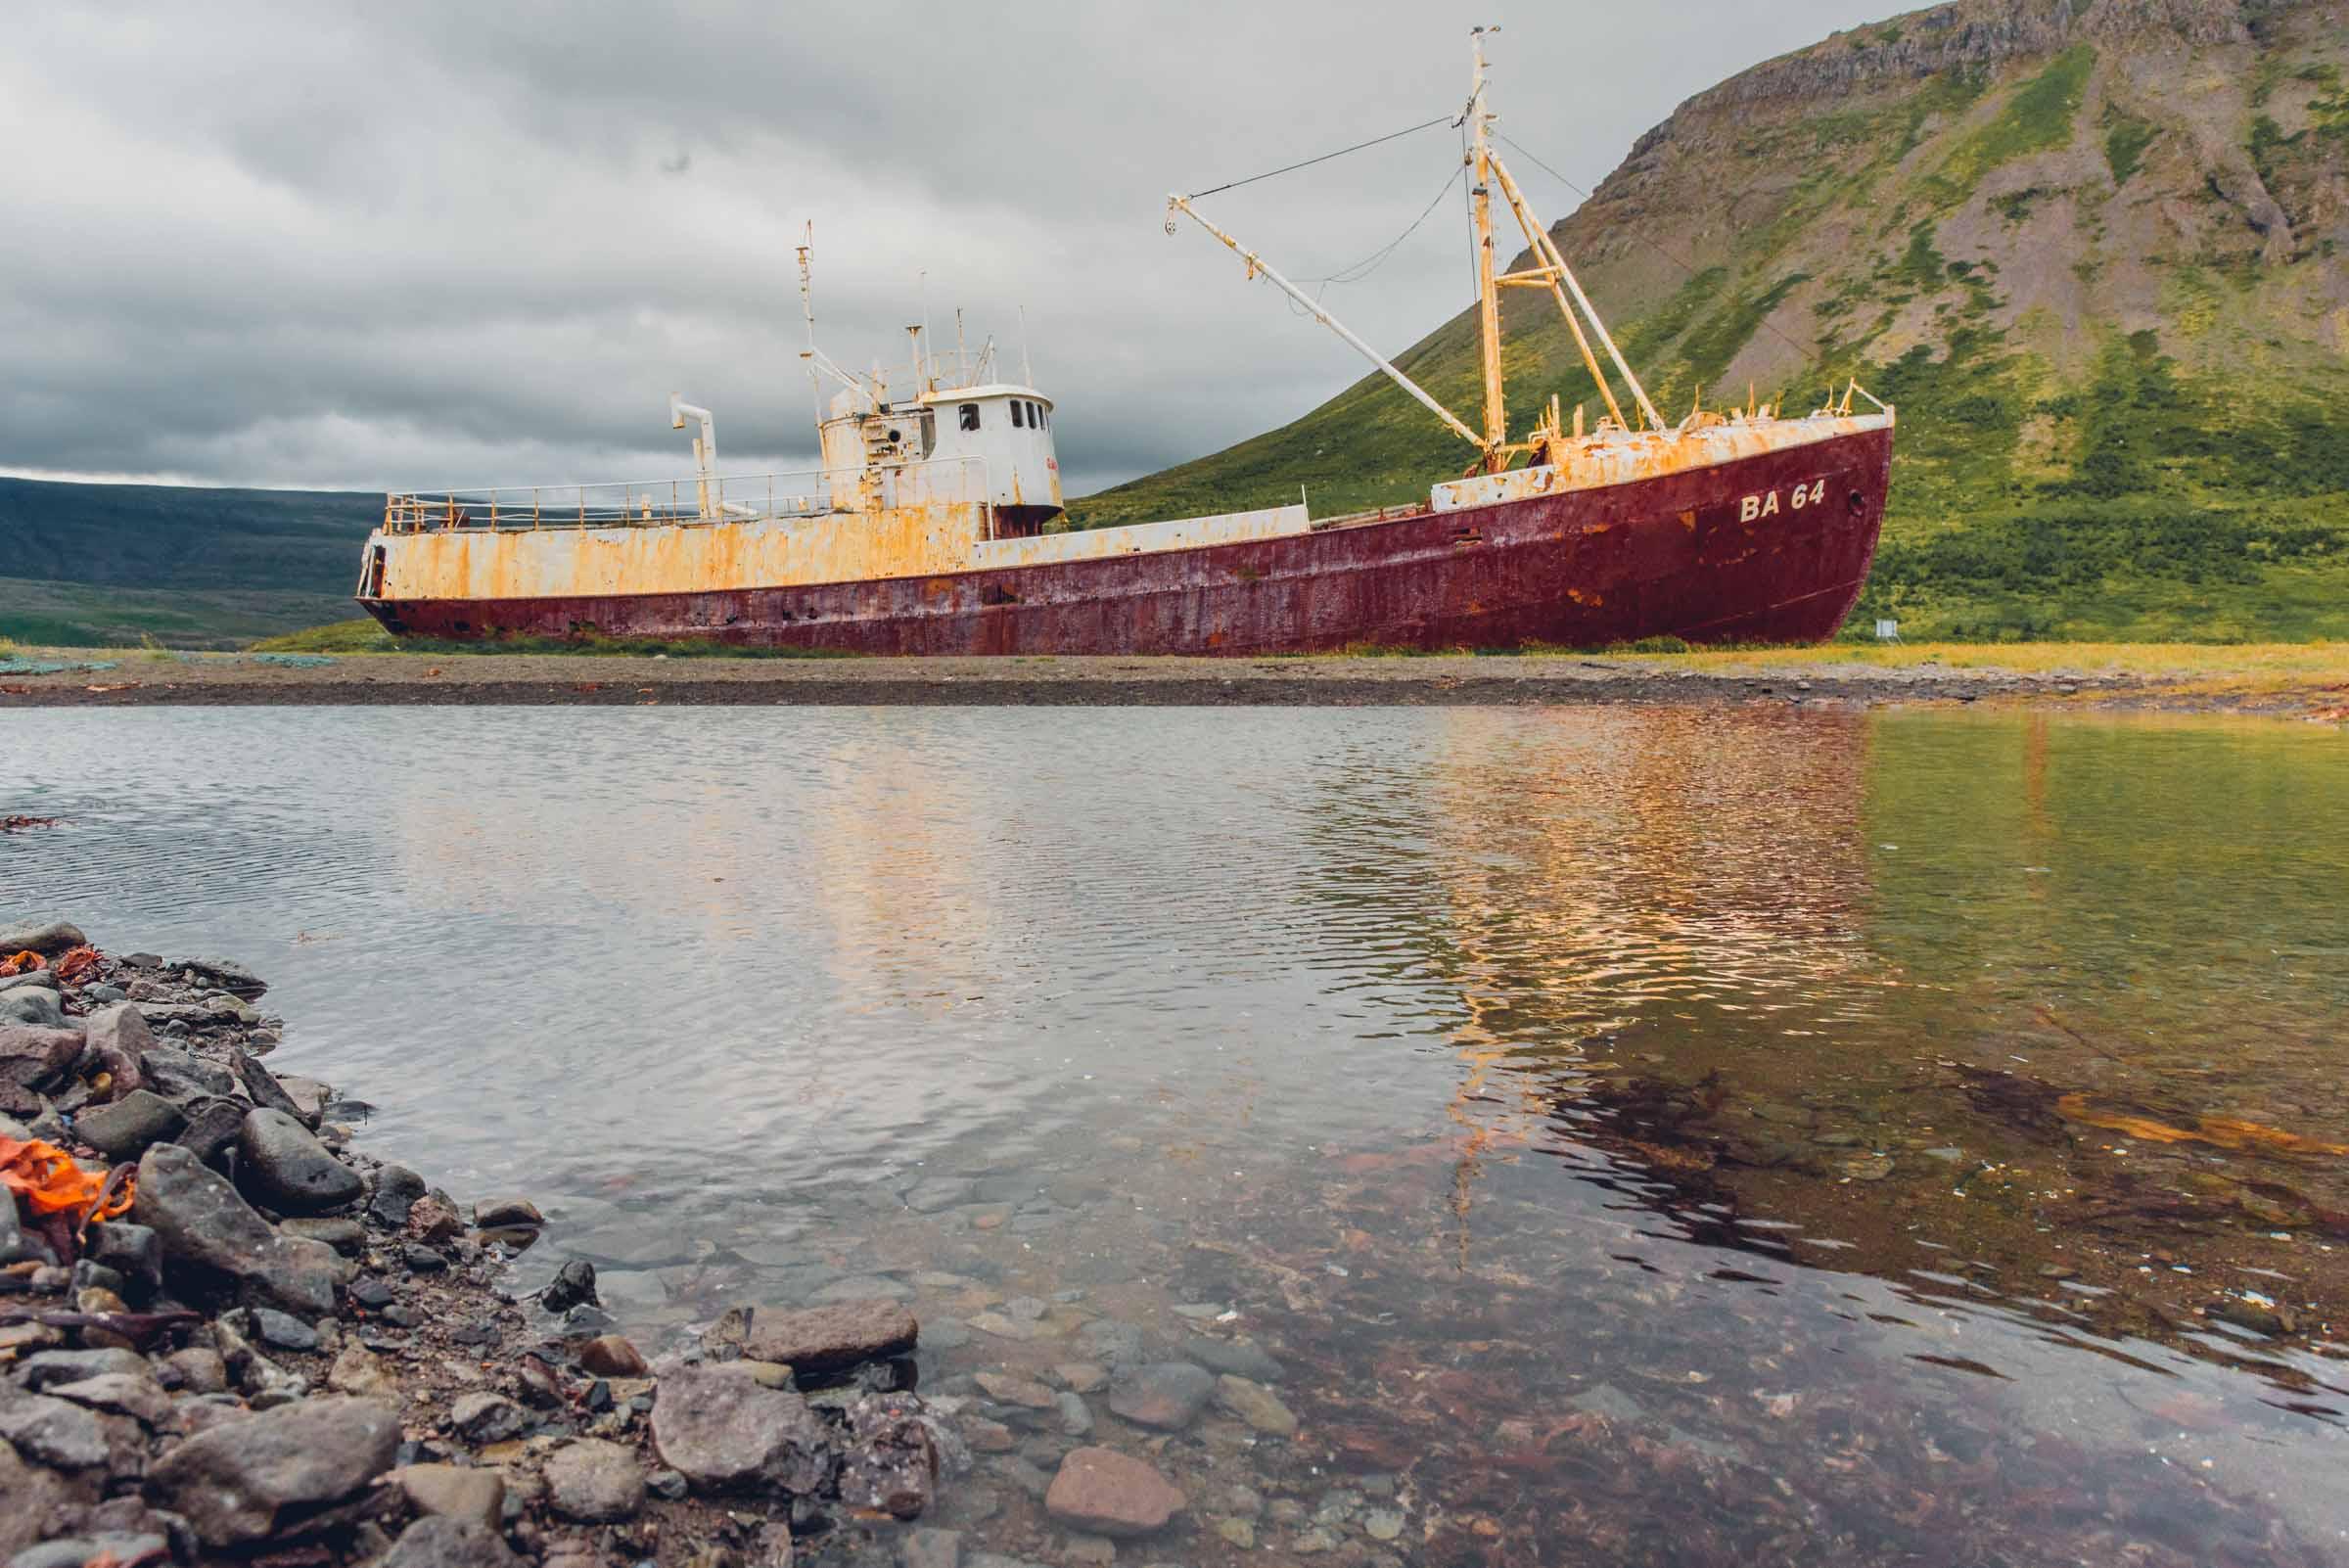 Garðar BA 64 Ship Wreck, ICeland